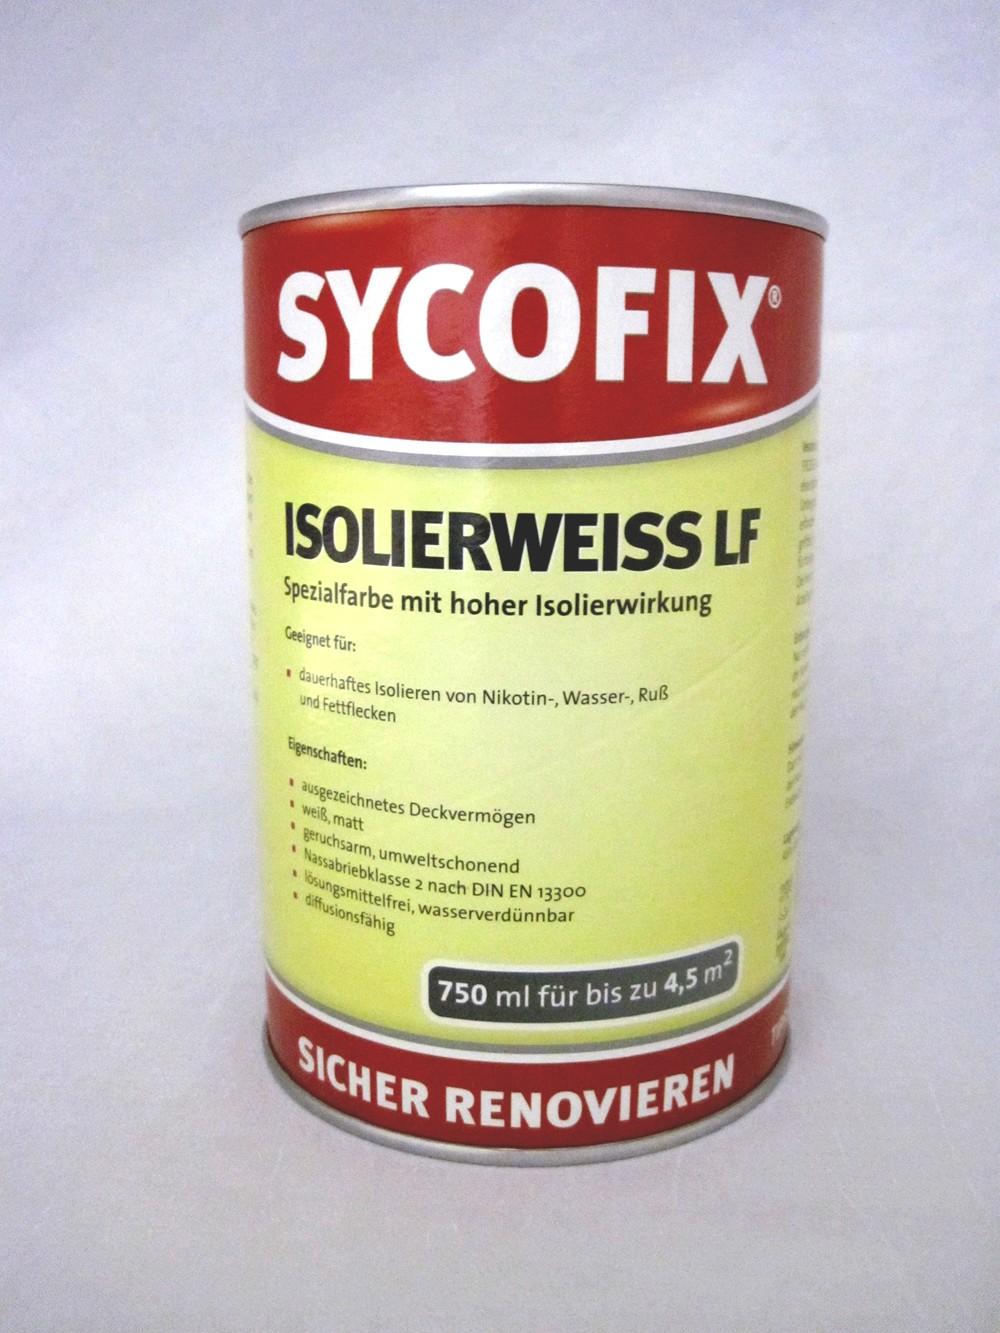 Sycofix - Isolierweiß 750 ml